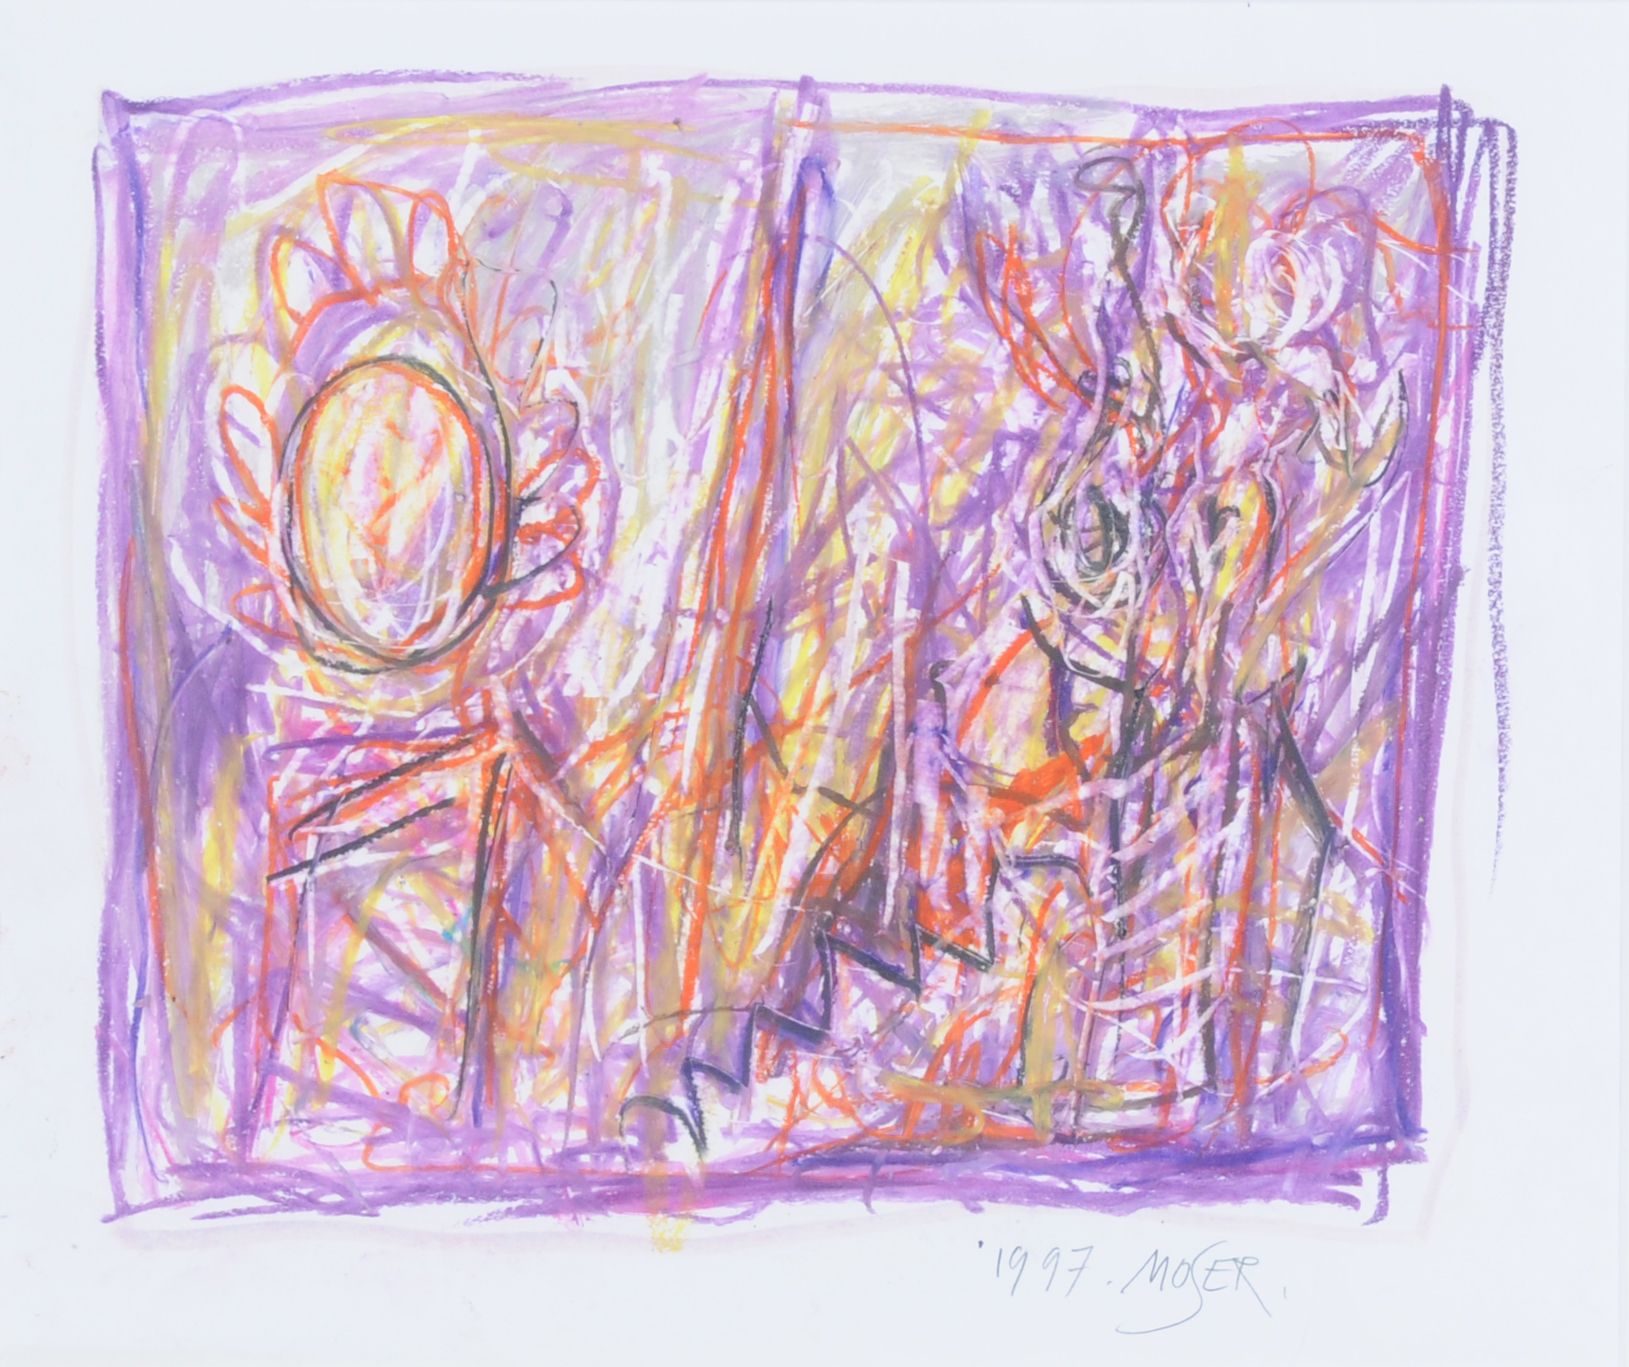 Moser Wilfrid, Untitled